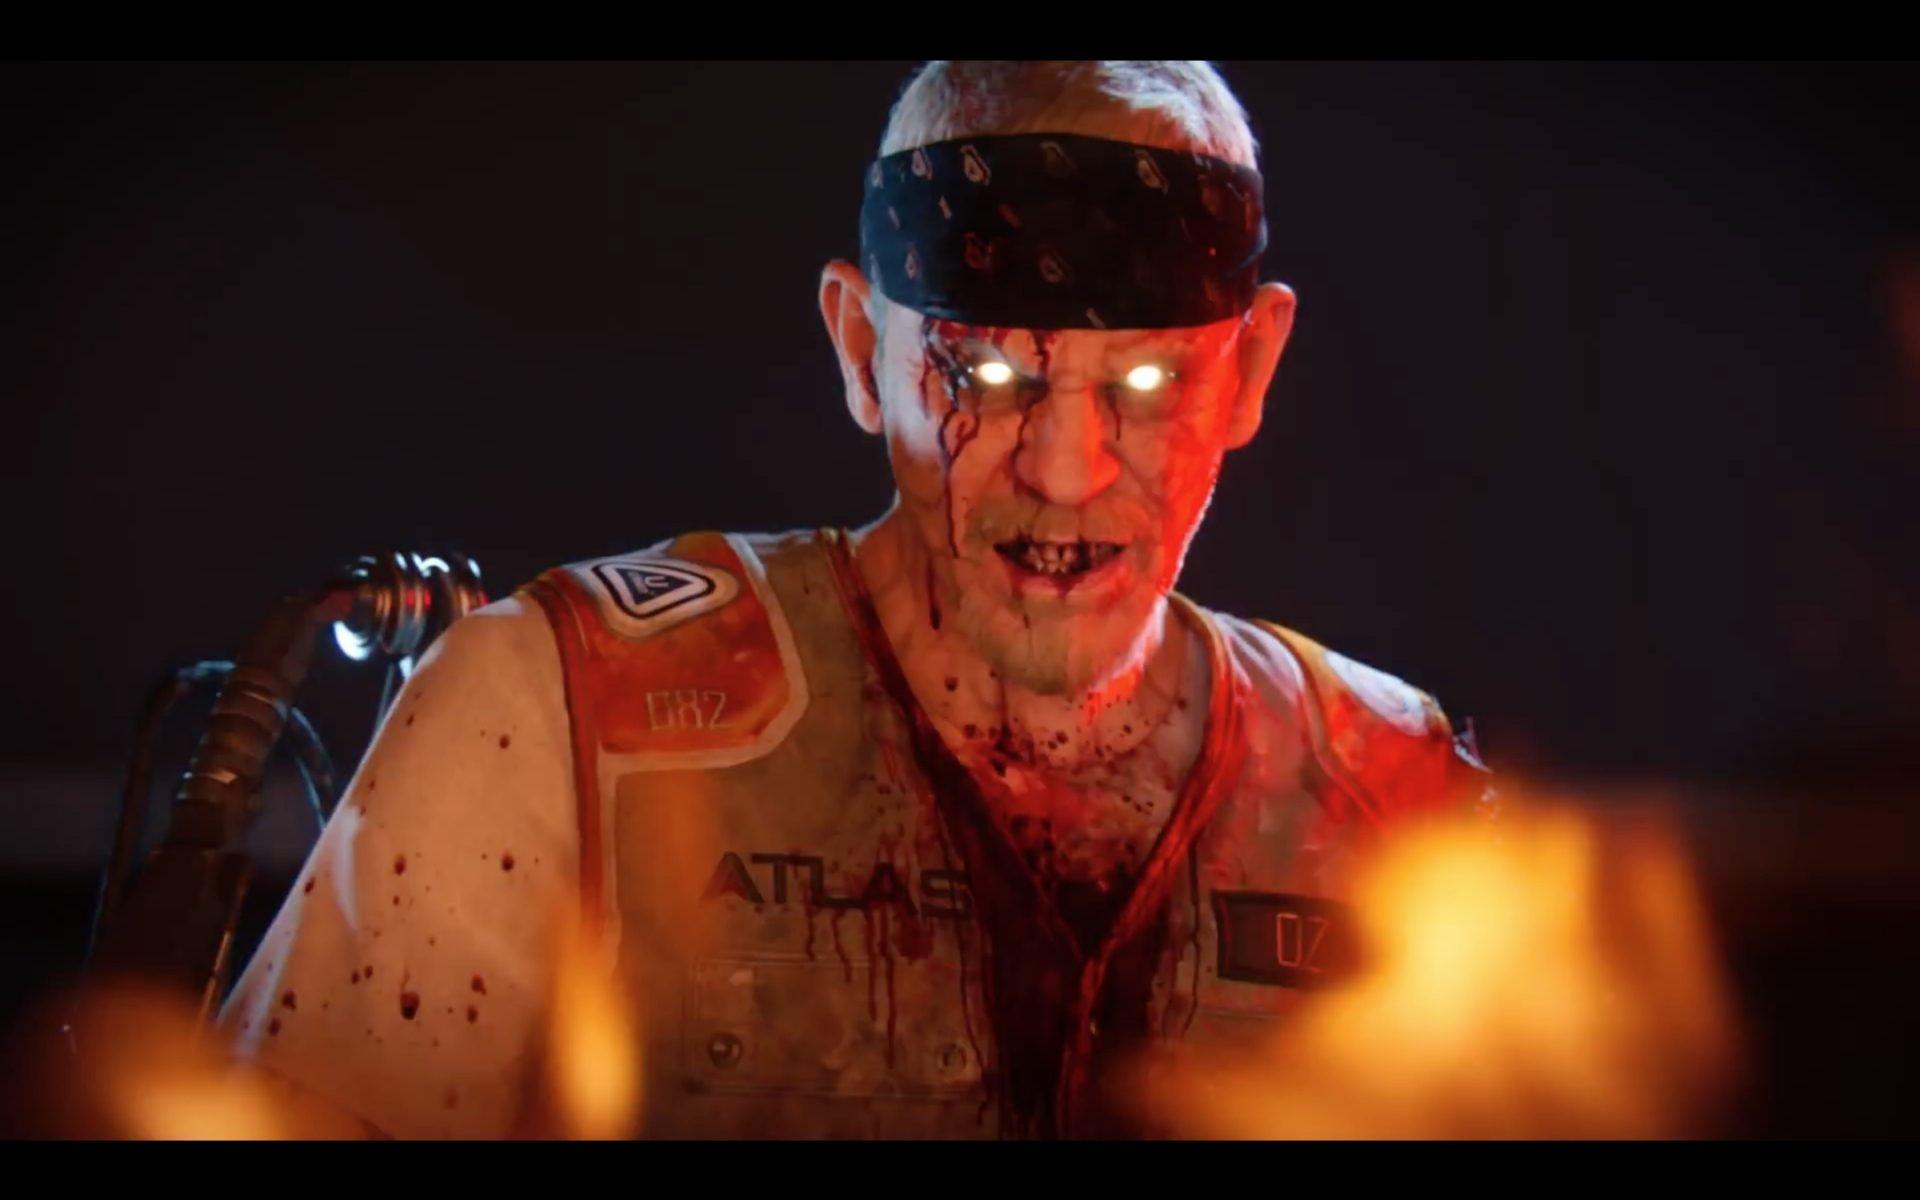 Call Of Duty Advanced Warfare Exo Zombies Descent Trailer 2